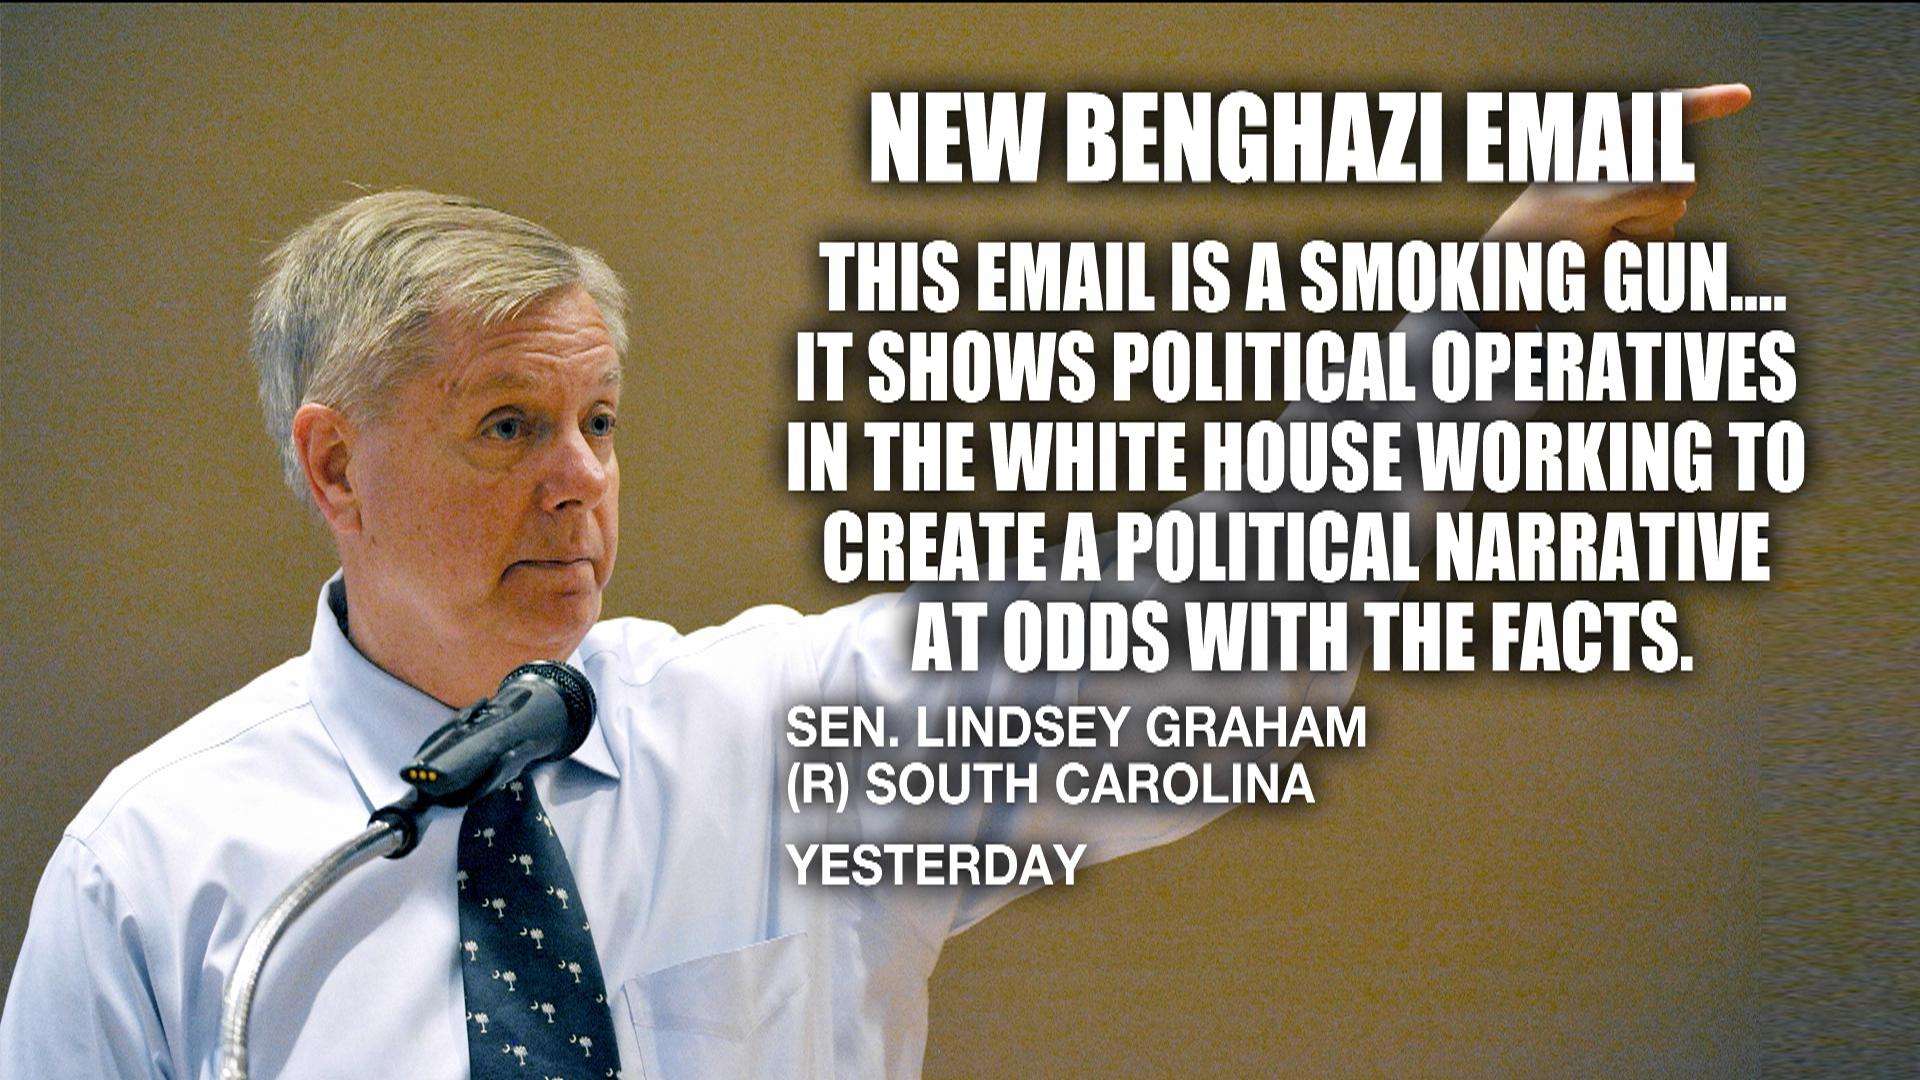 Graham: New Benghazi email is 'a smoking gun'